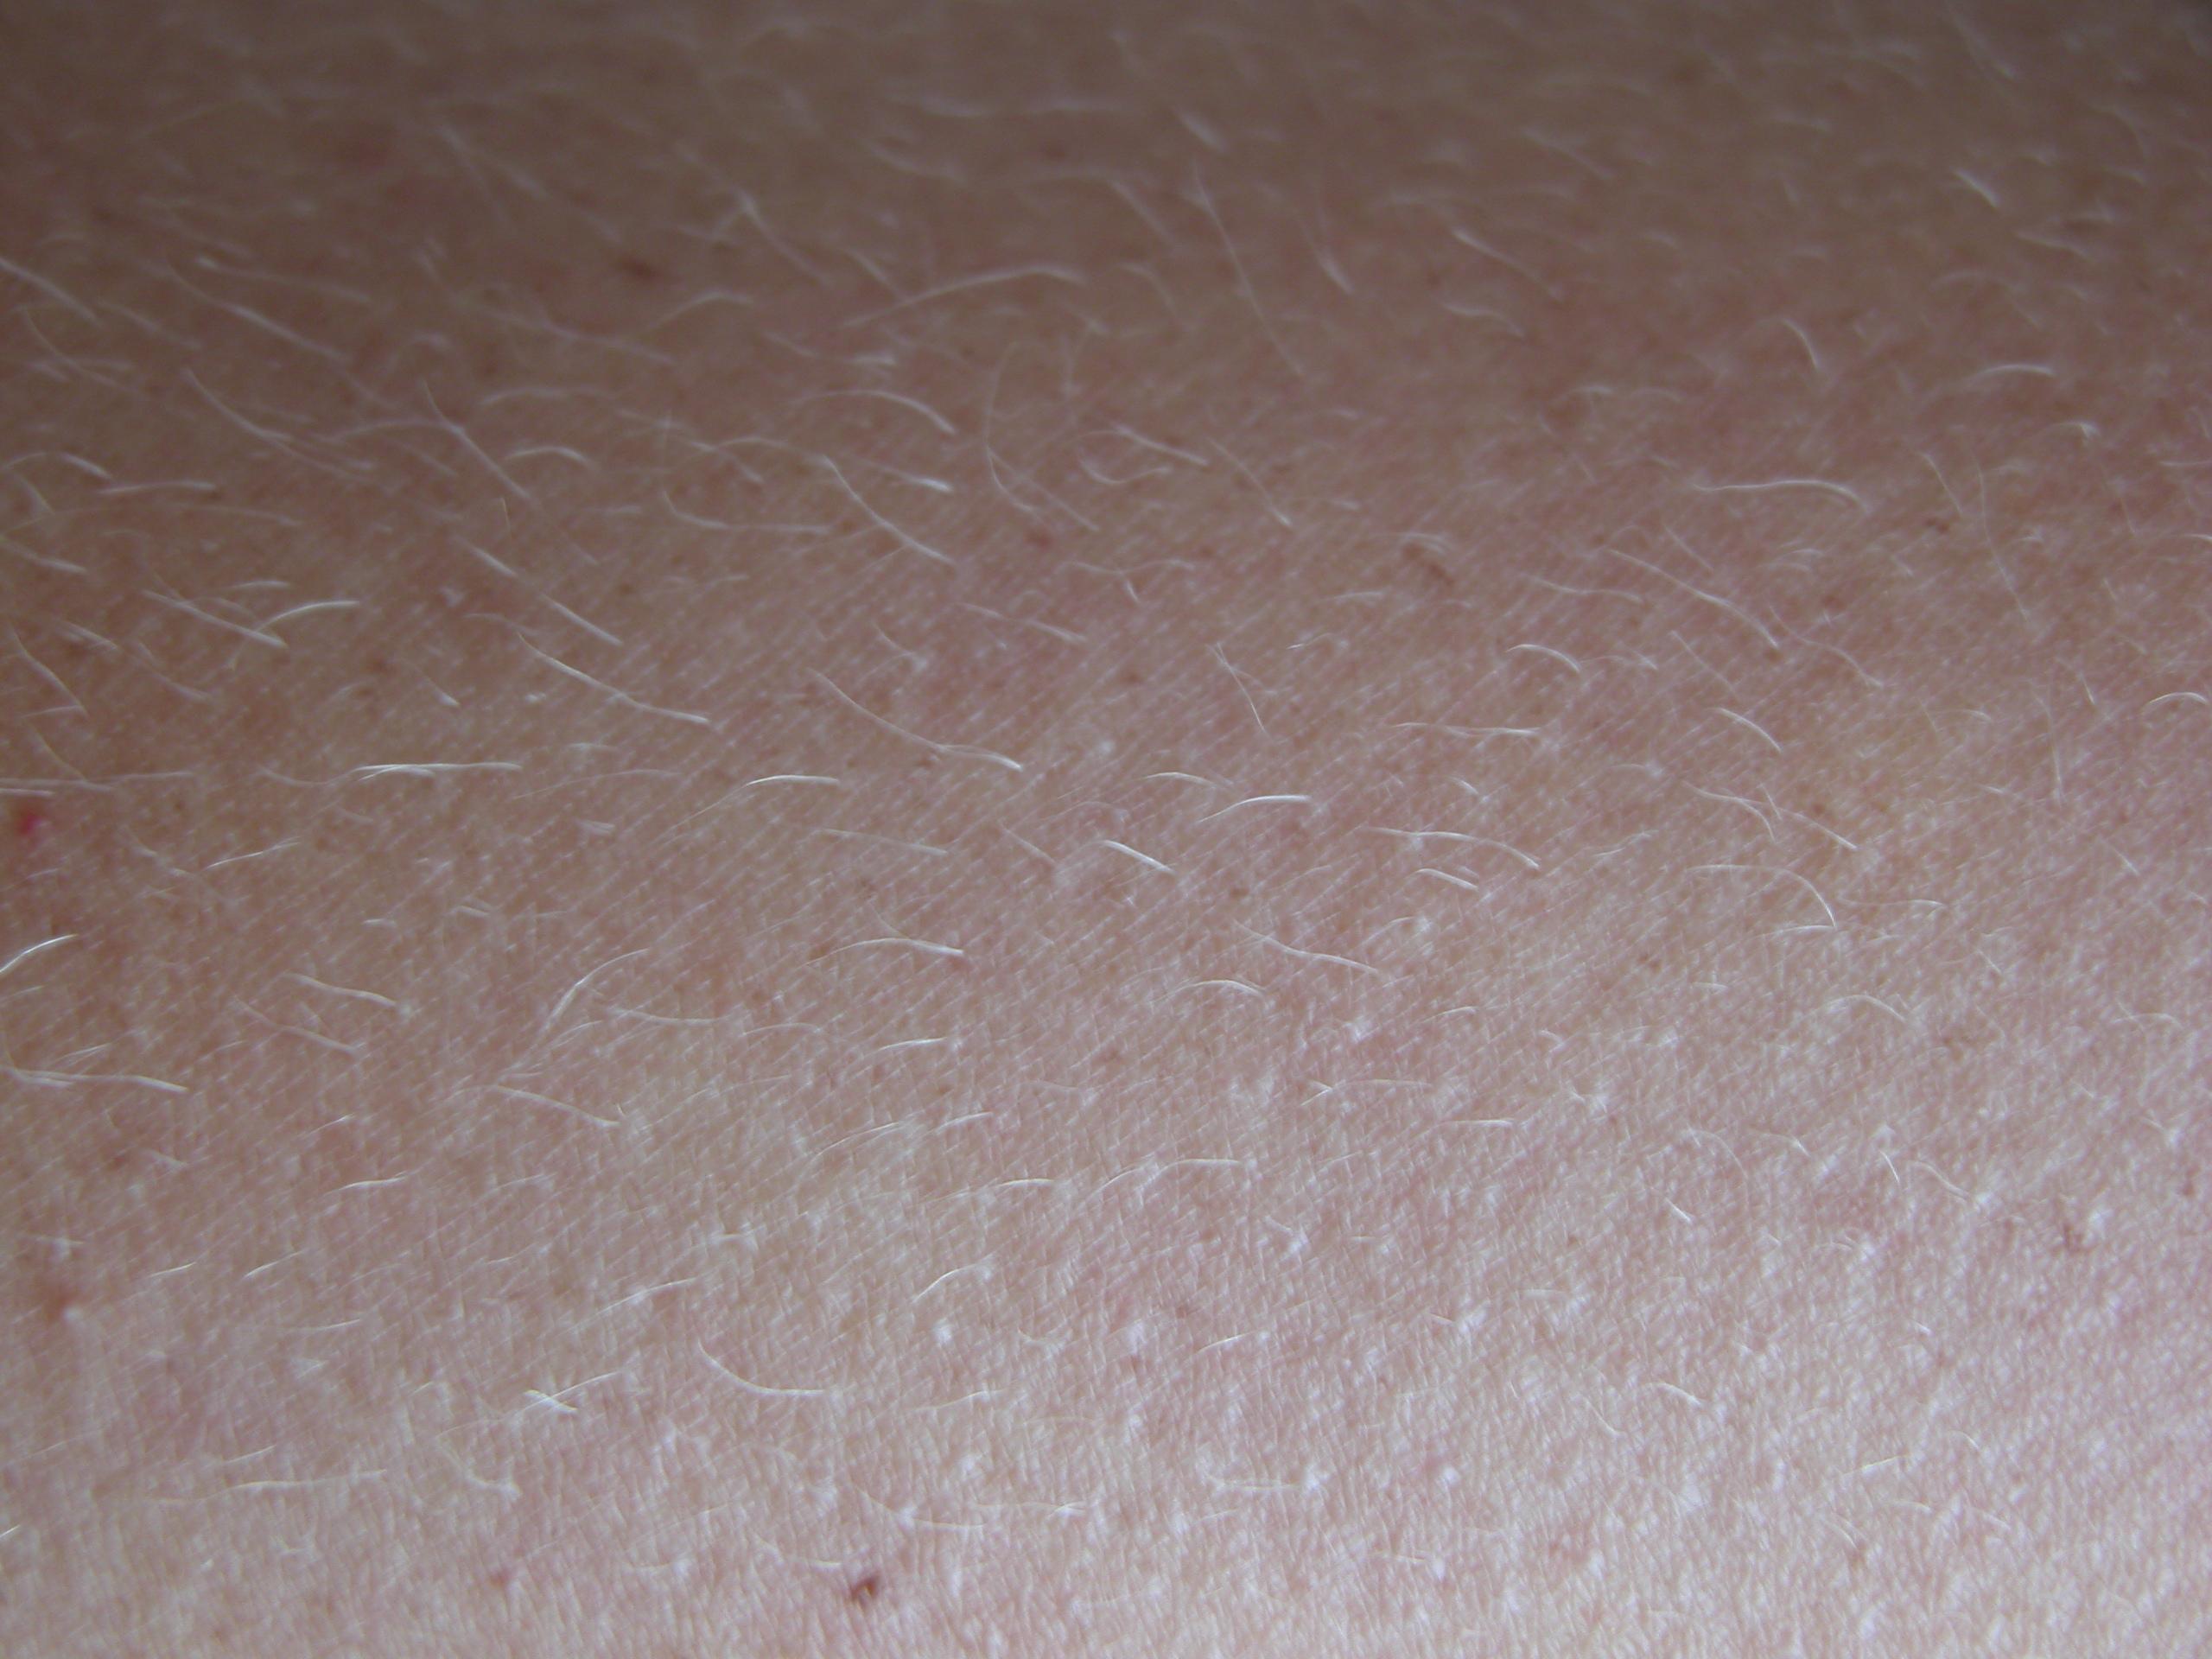 50 Must-Have Skin Textures   Top Design Magazine - Web ...